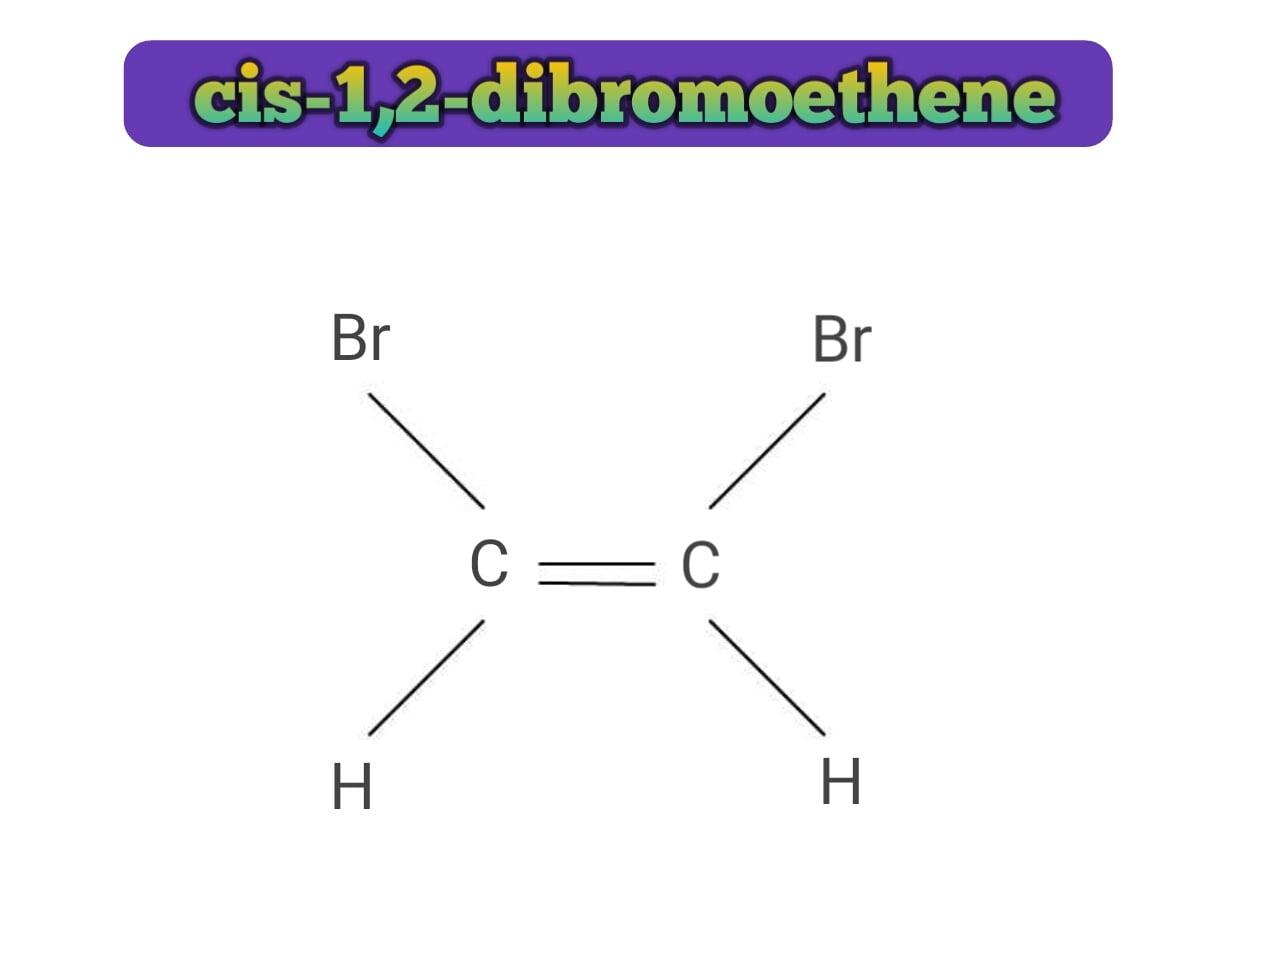 cis-1,2-dibromoethene